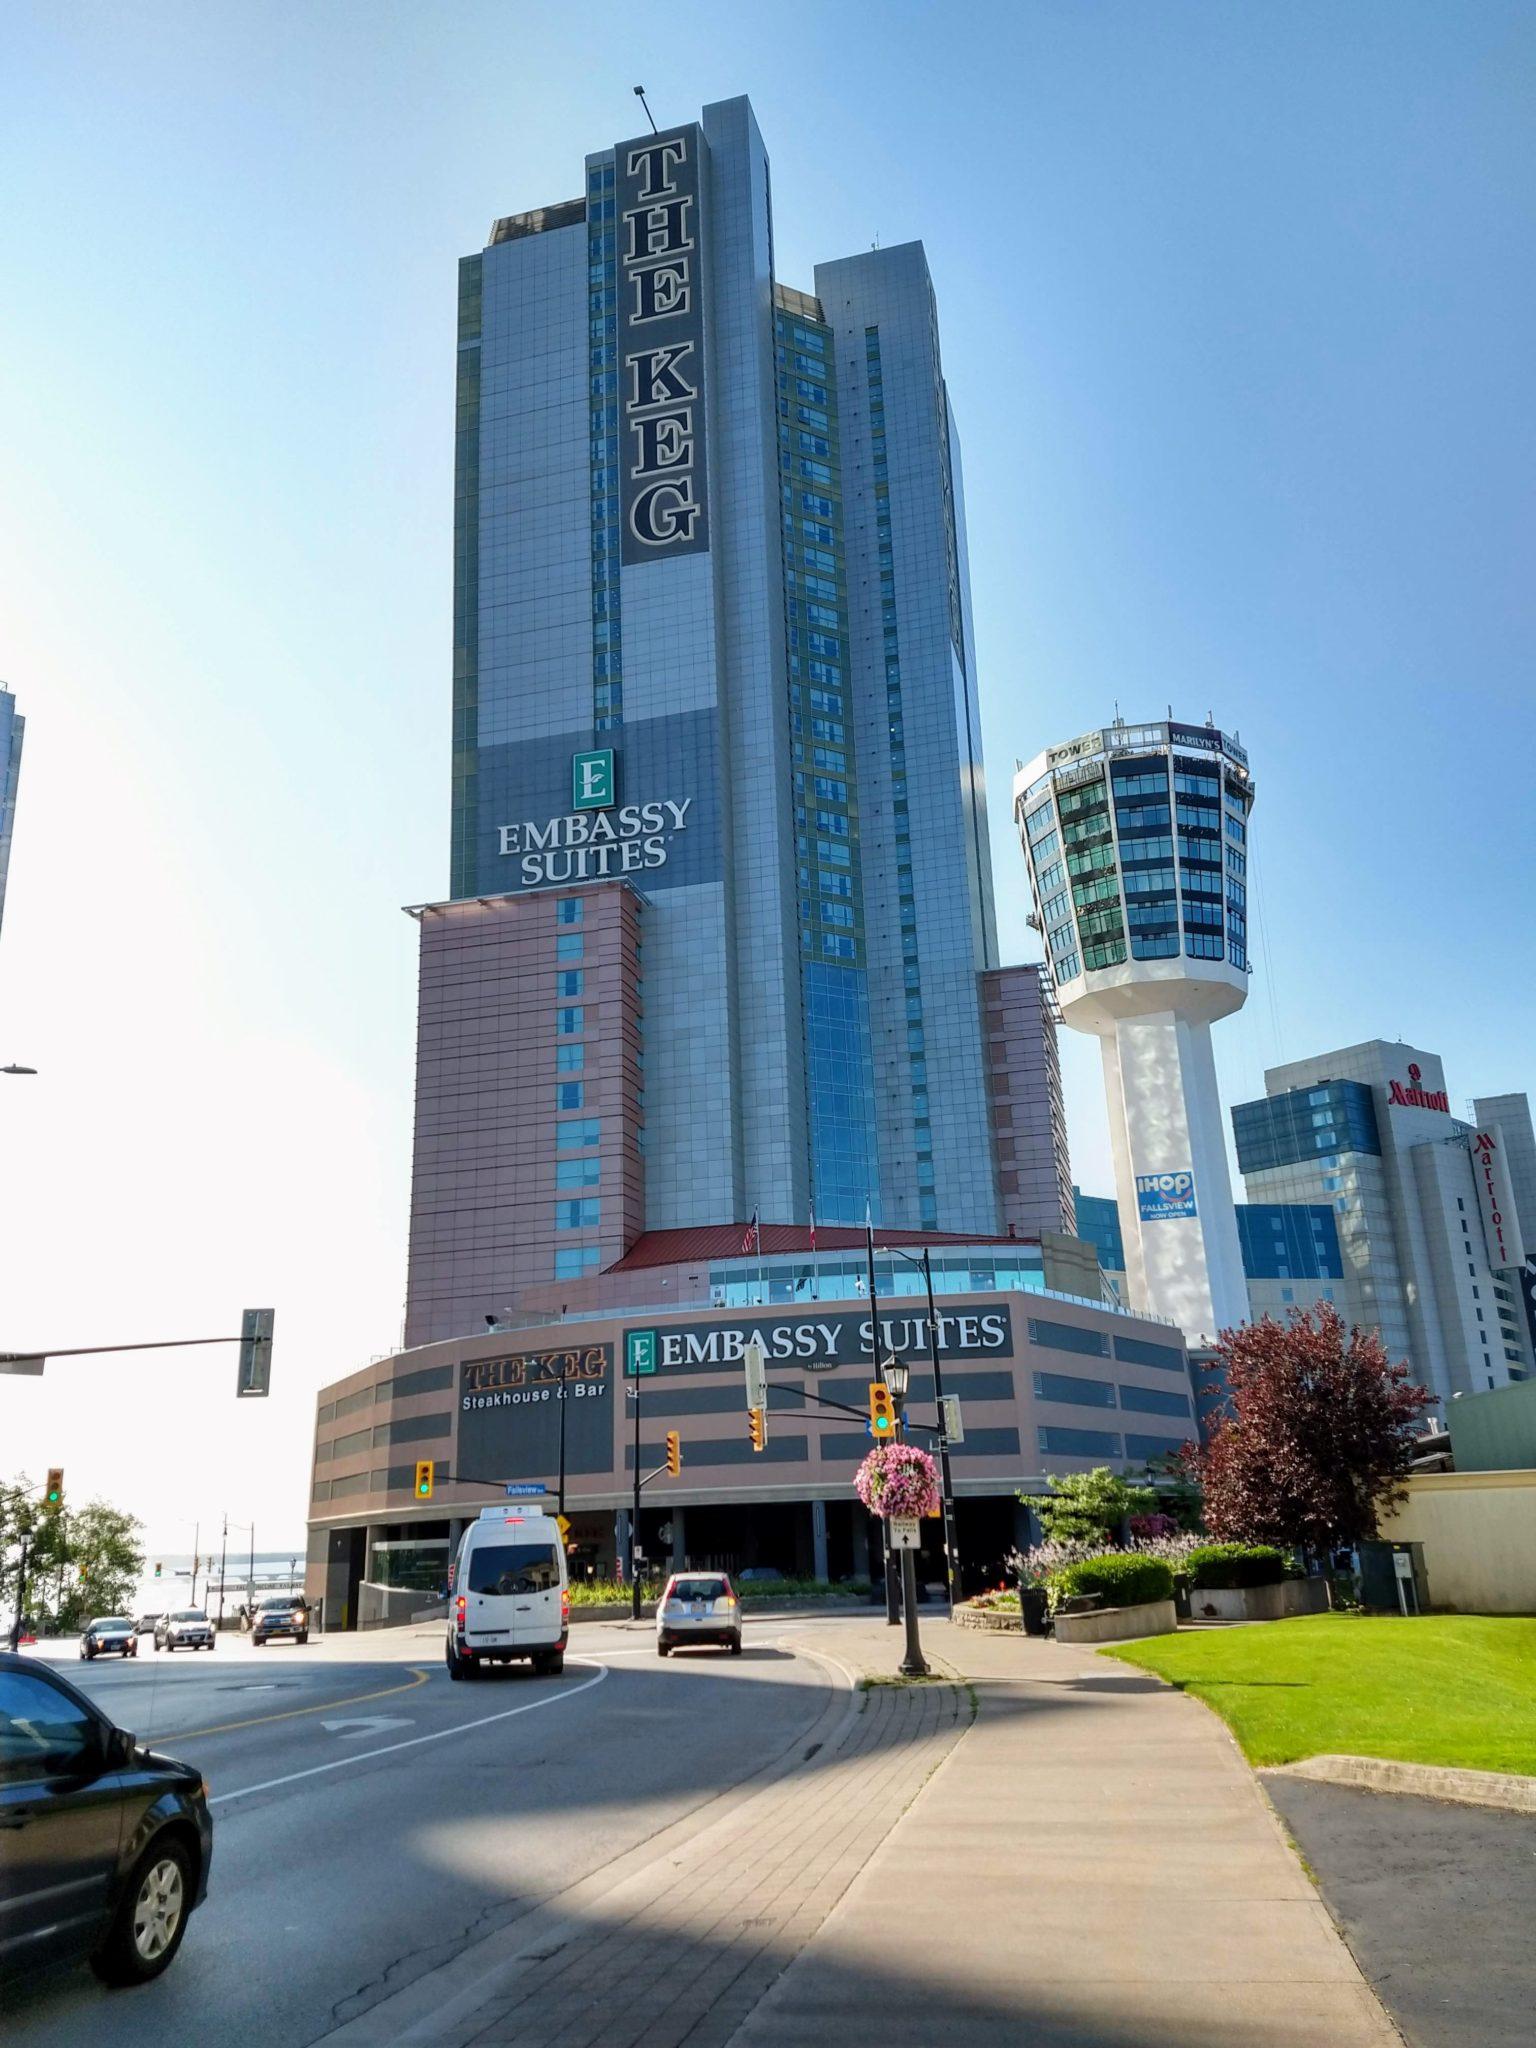 Emabassy Suites Fallsview Hotel Niagara Falls Ontario Canada 2019